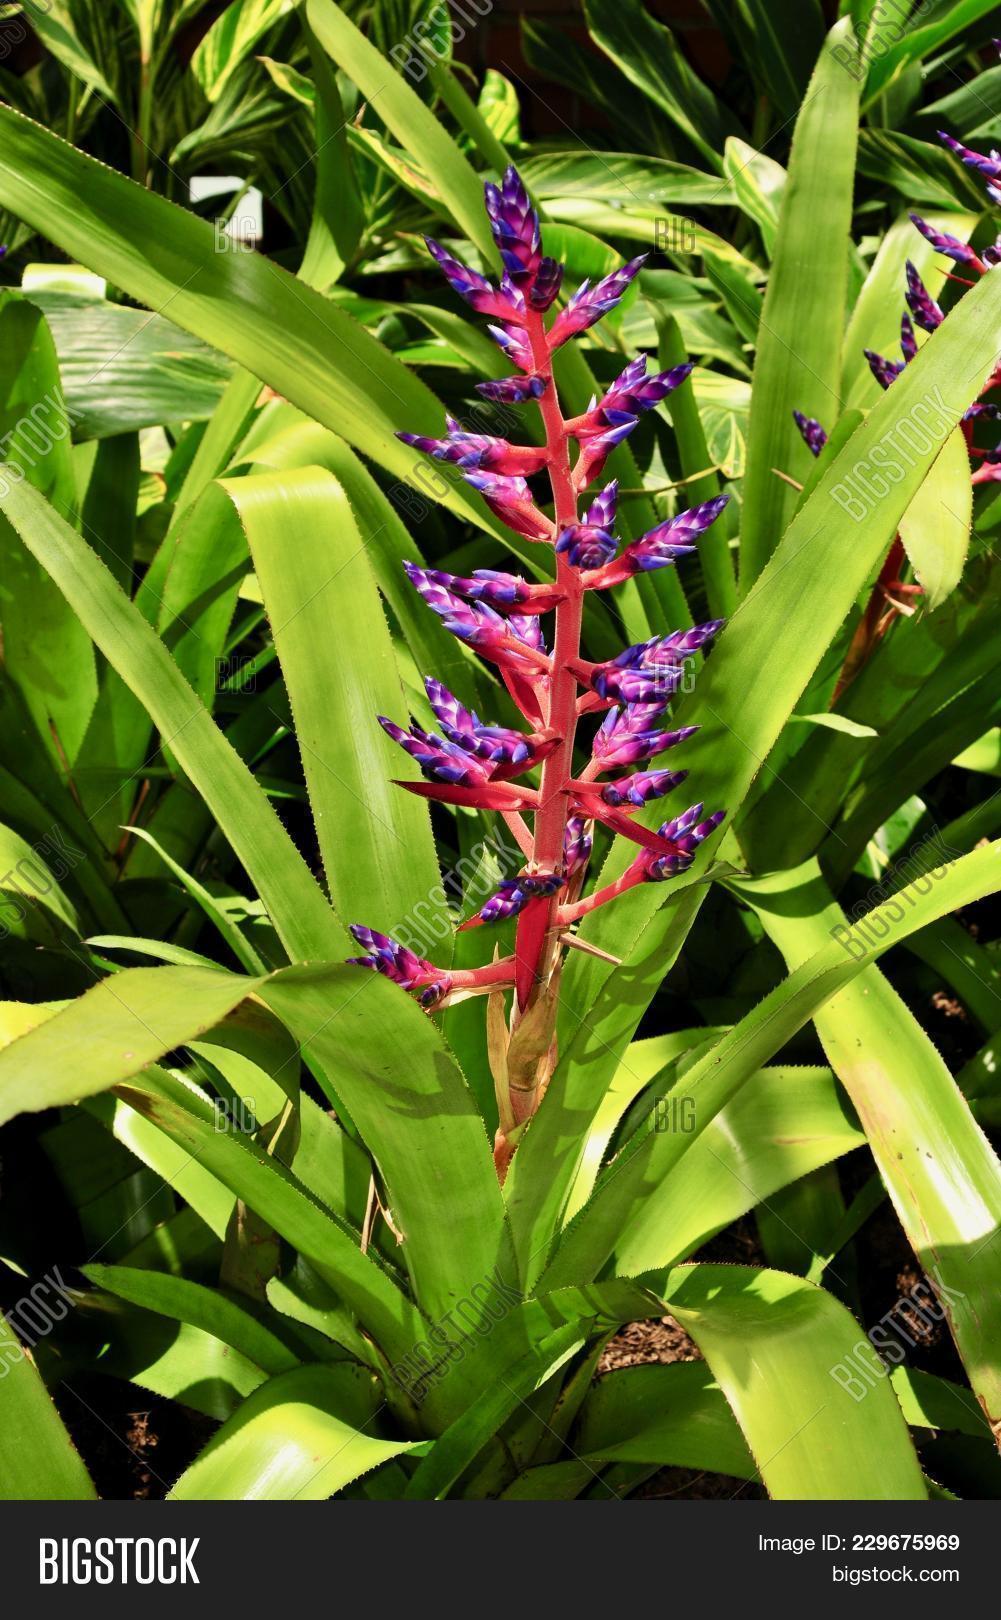 Purple Red Flower Image & Photo (Free Trial) | Bigstock on purple leaf plants with leaf, purple leaf shrub with pink flowers, hydrangea with purple leaves,